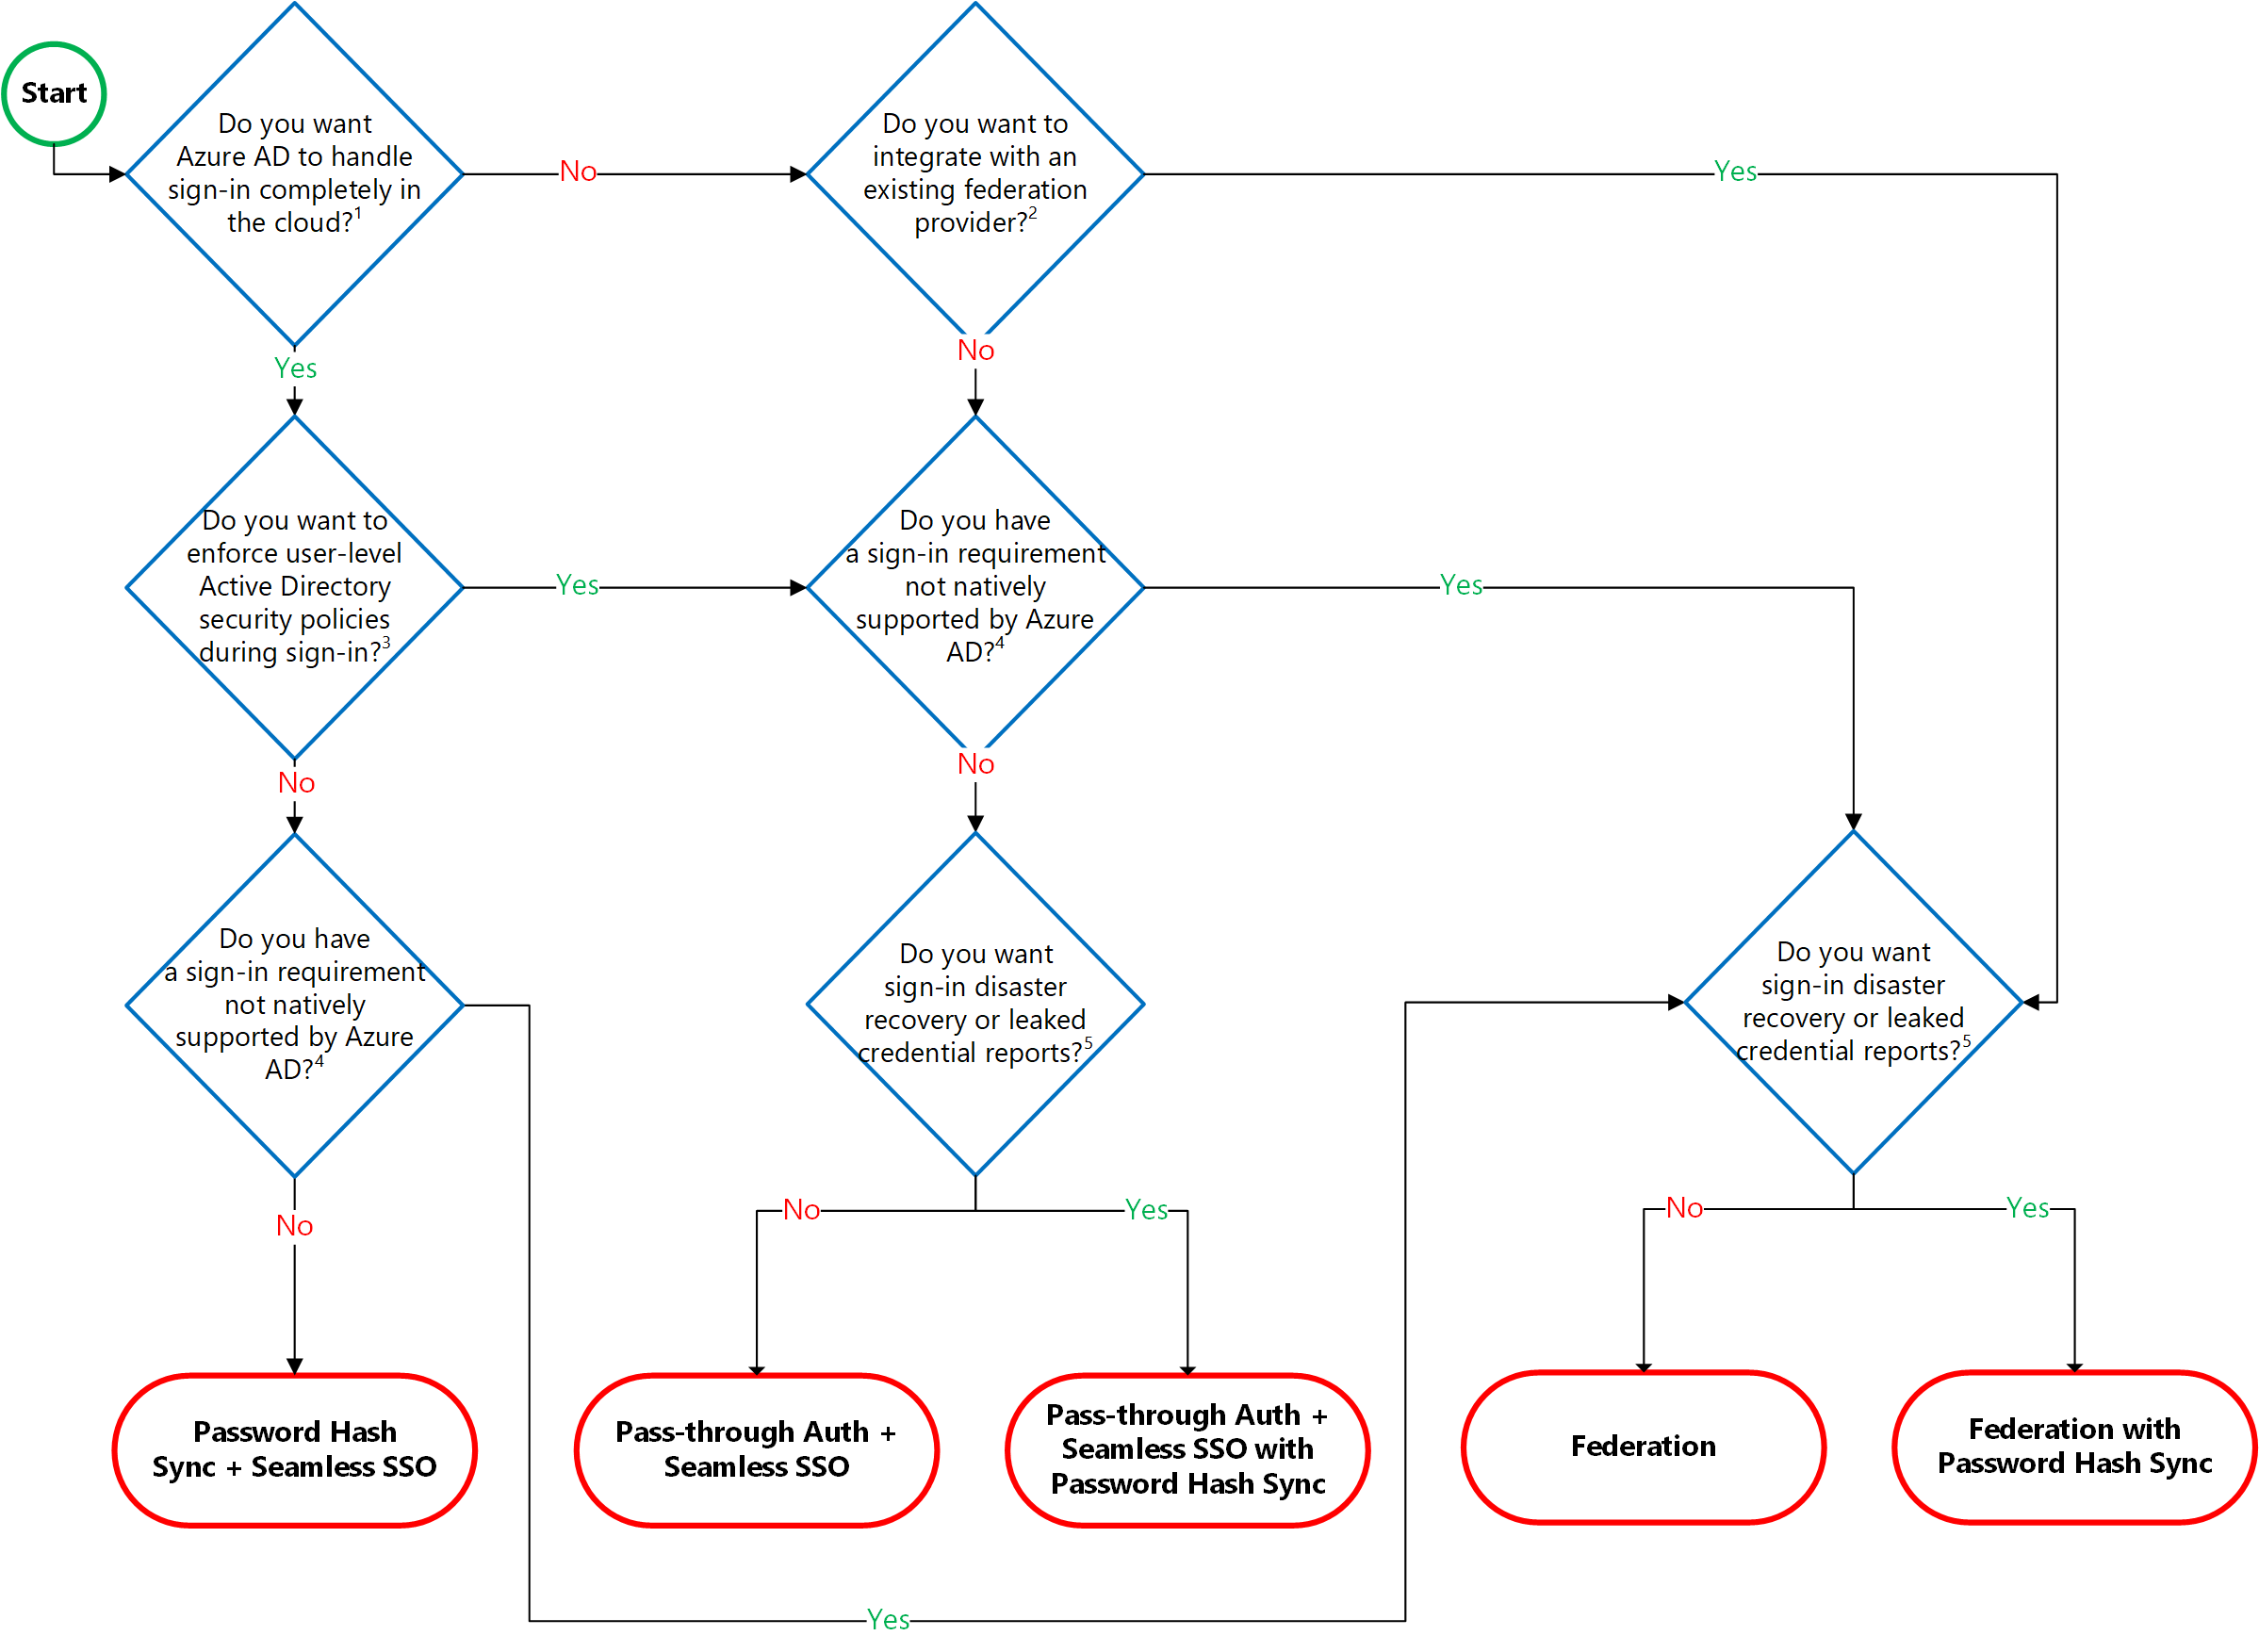 Azure Ad Authn Image on User Authentication Diagram